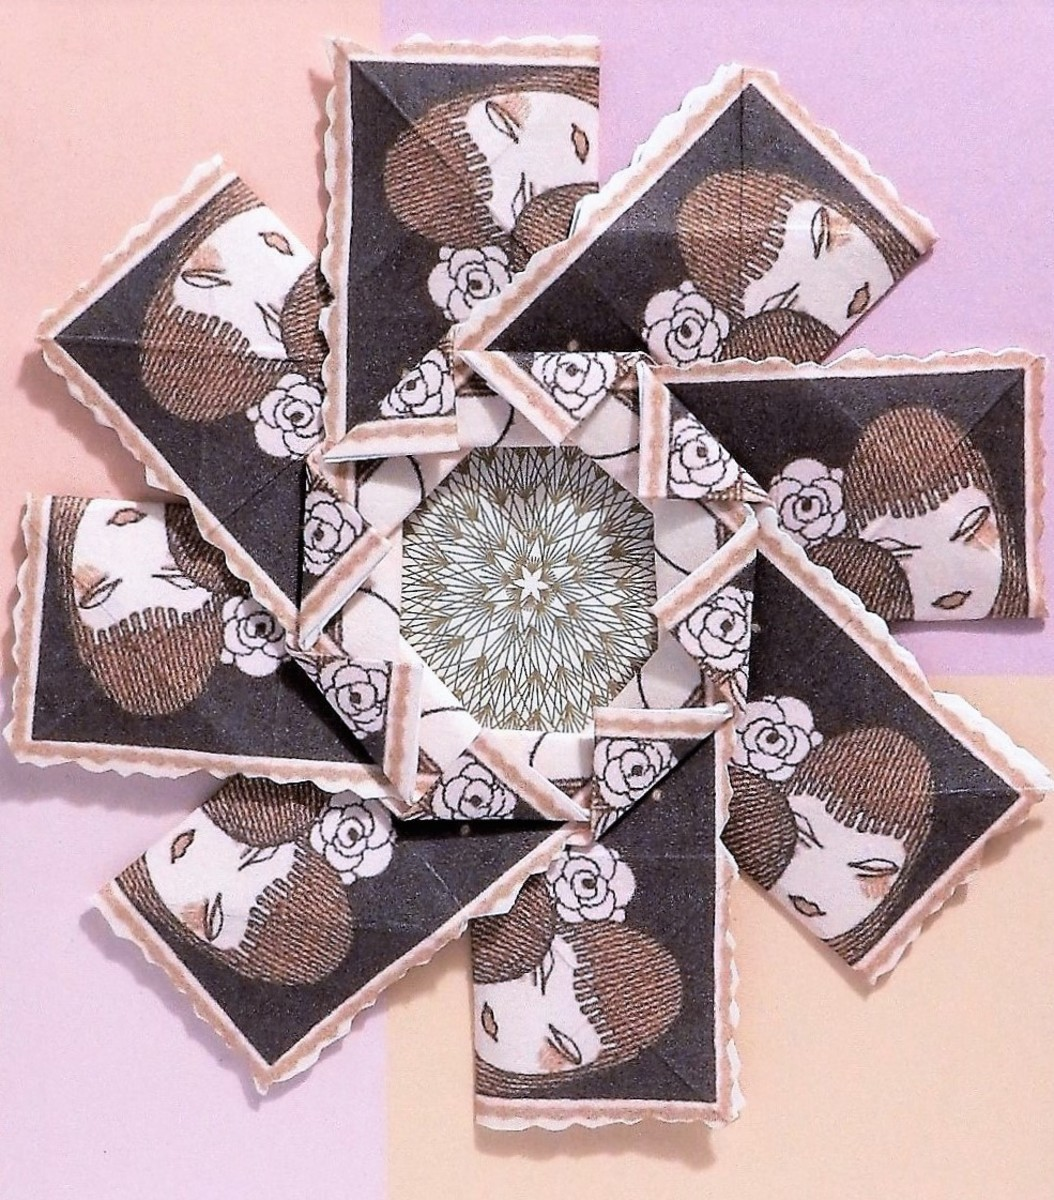 Tea Bag Folding: a Flat Unit Origami Craft